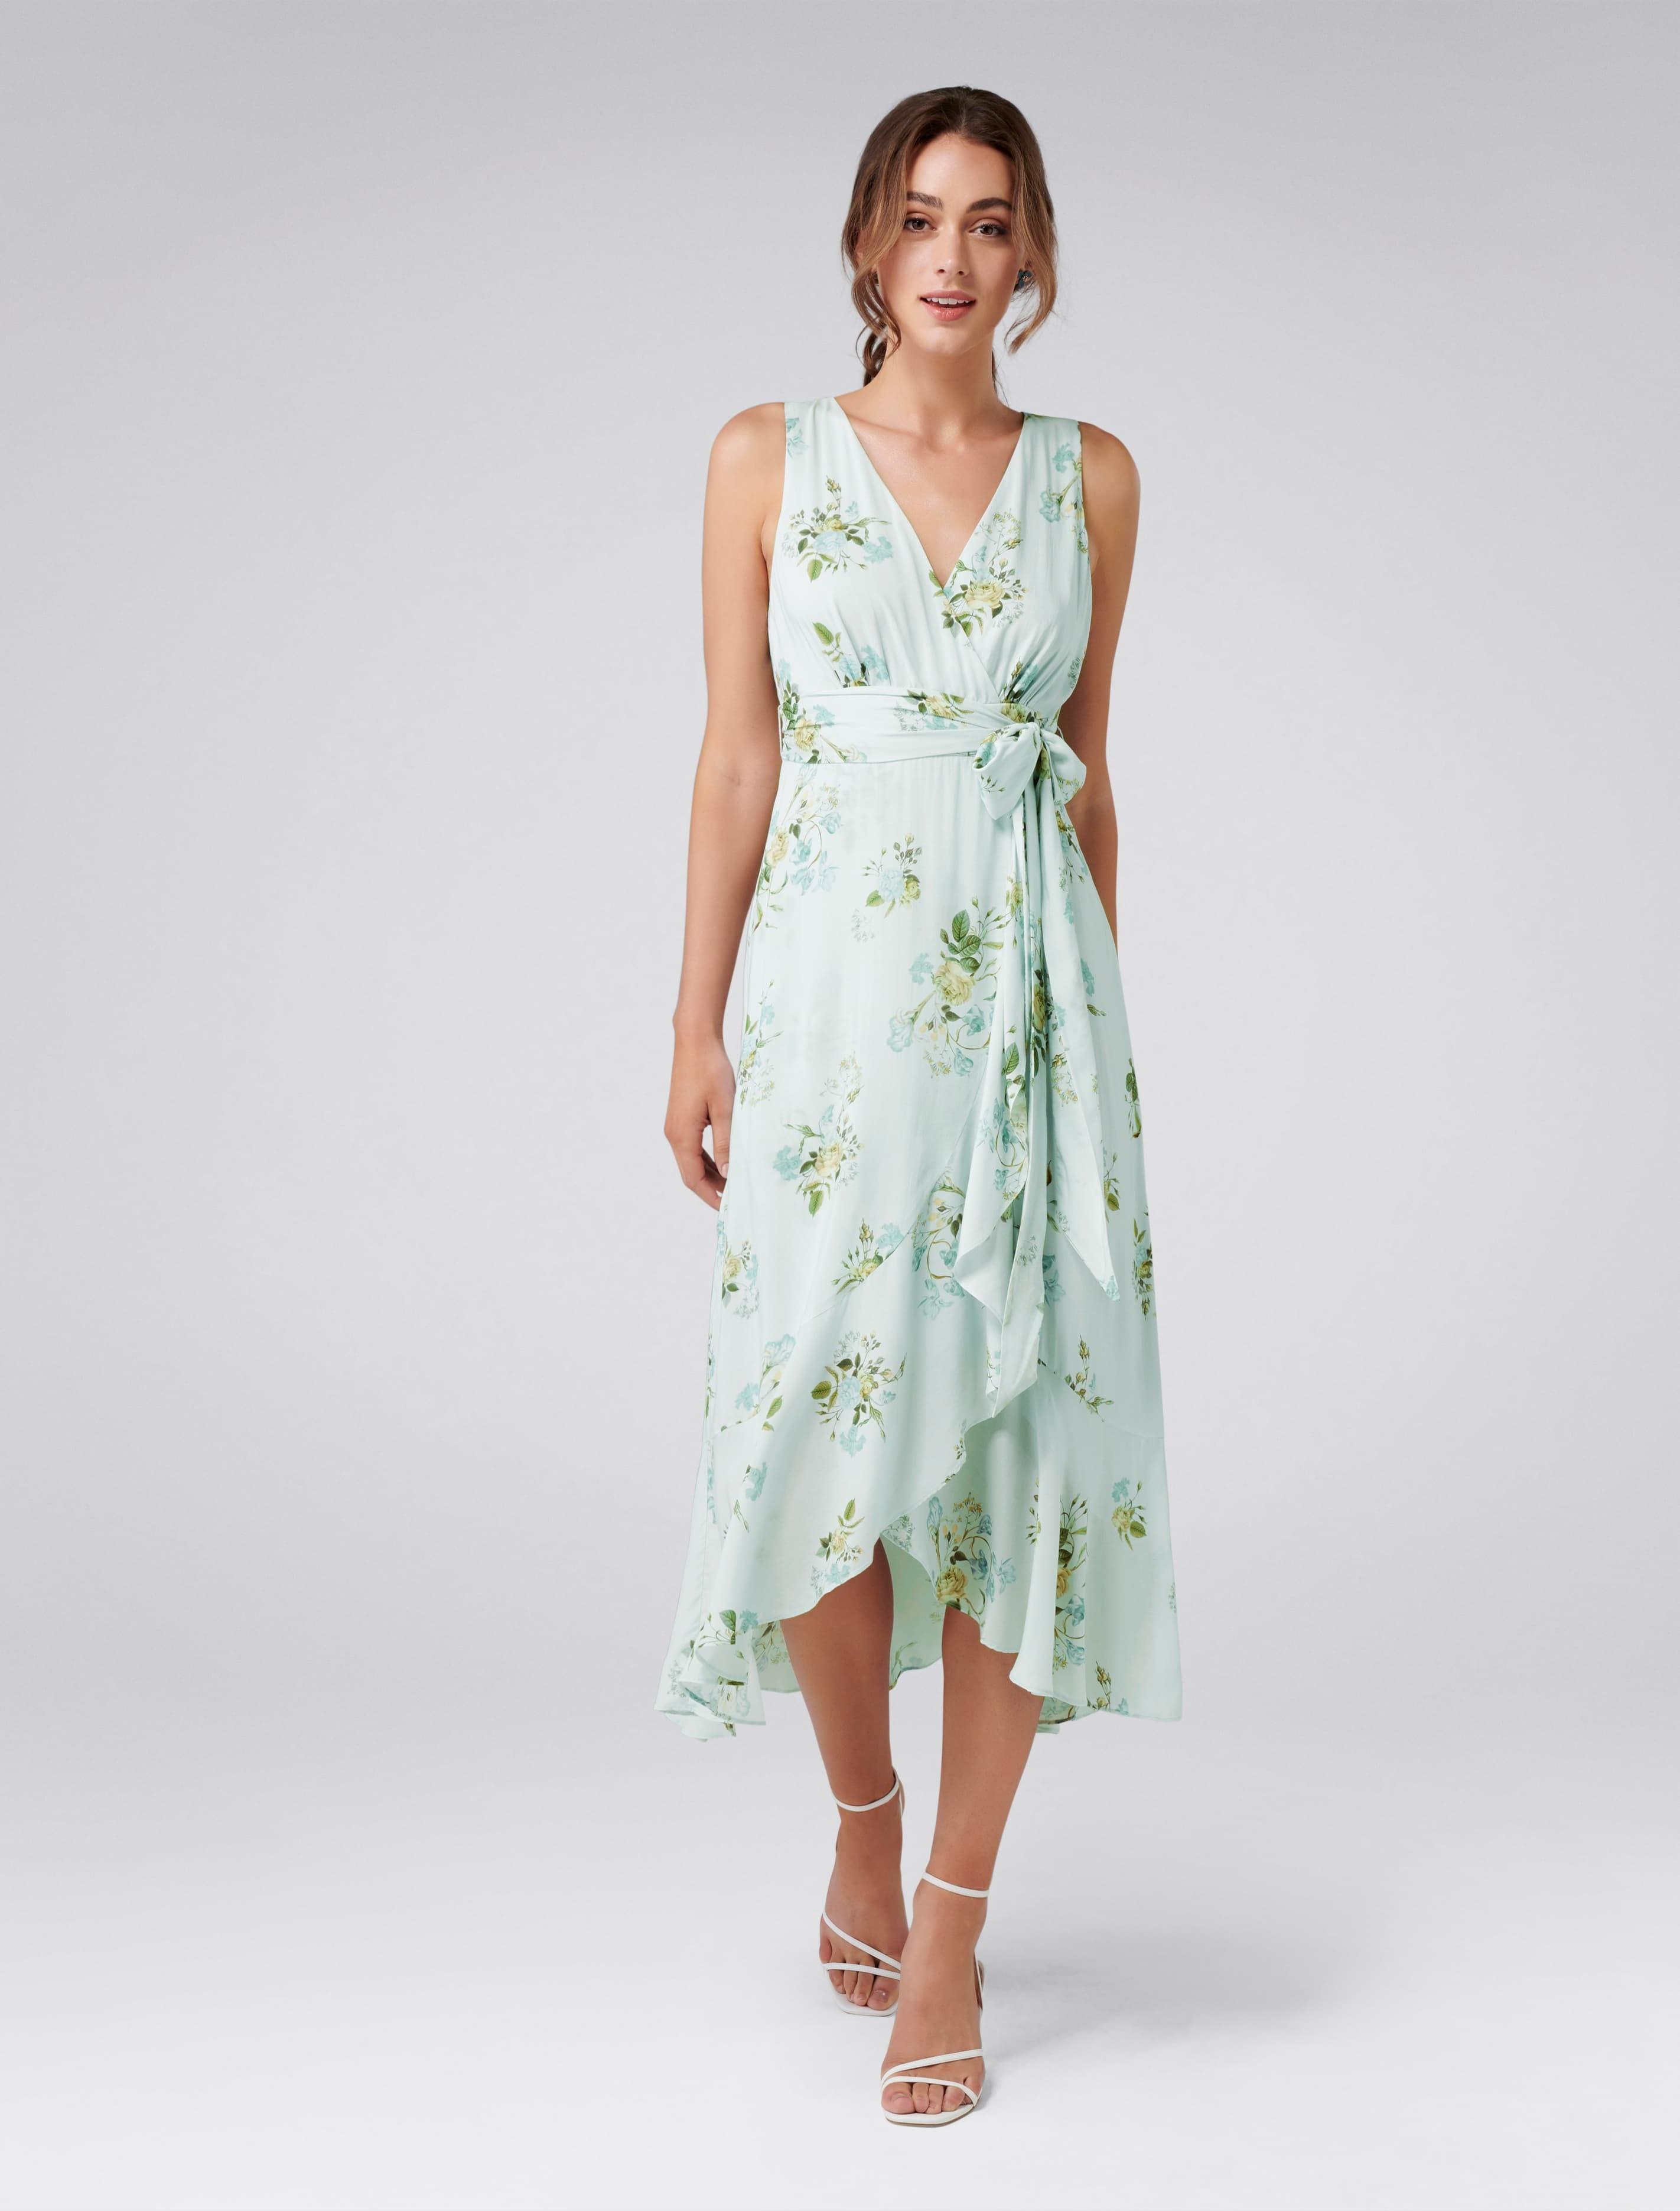 Vintage 1920s Dresses – Where to Buy Cora Wrap Front Midi Dress - Soft Botanical - 8 $74.95 AT vintagedancer.com